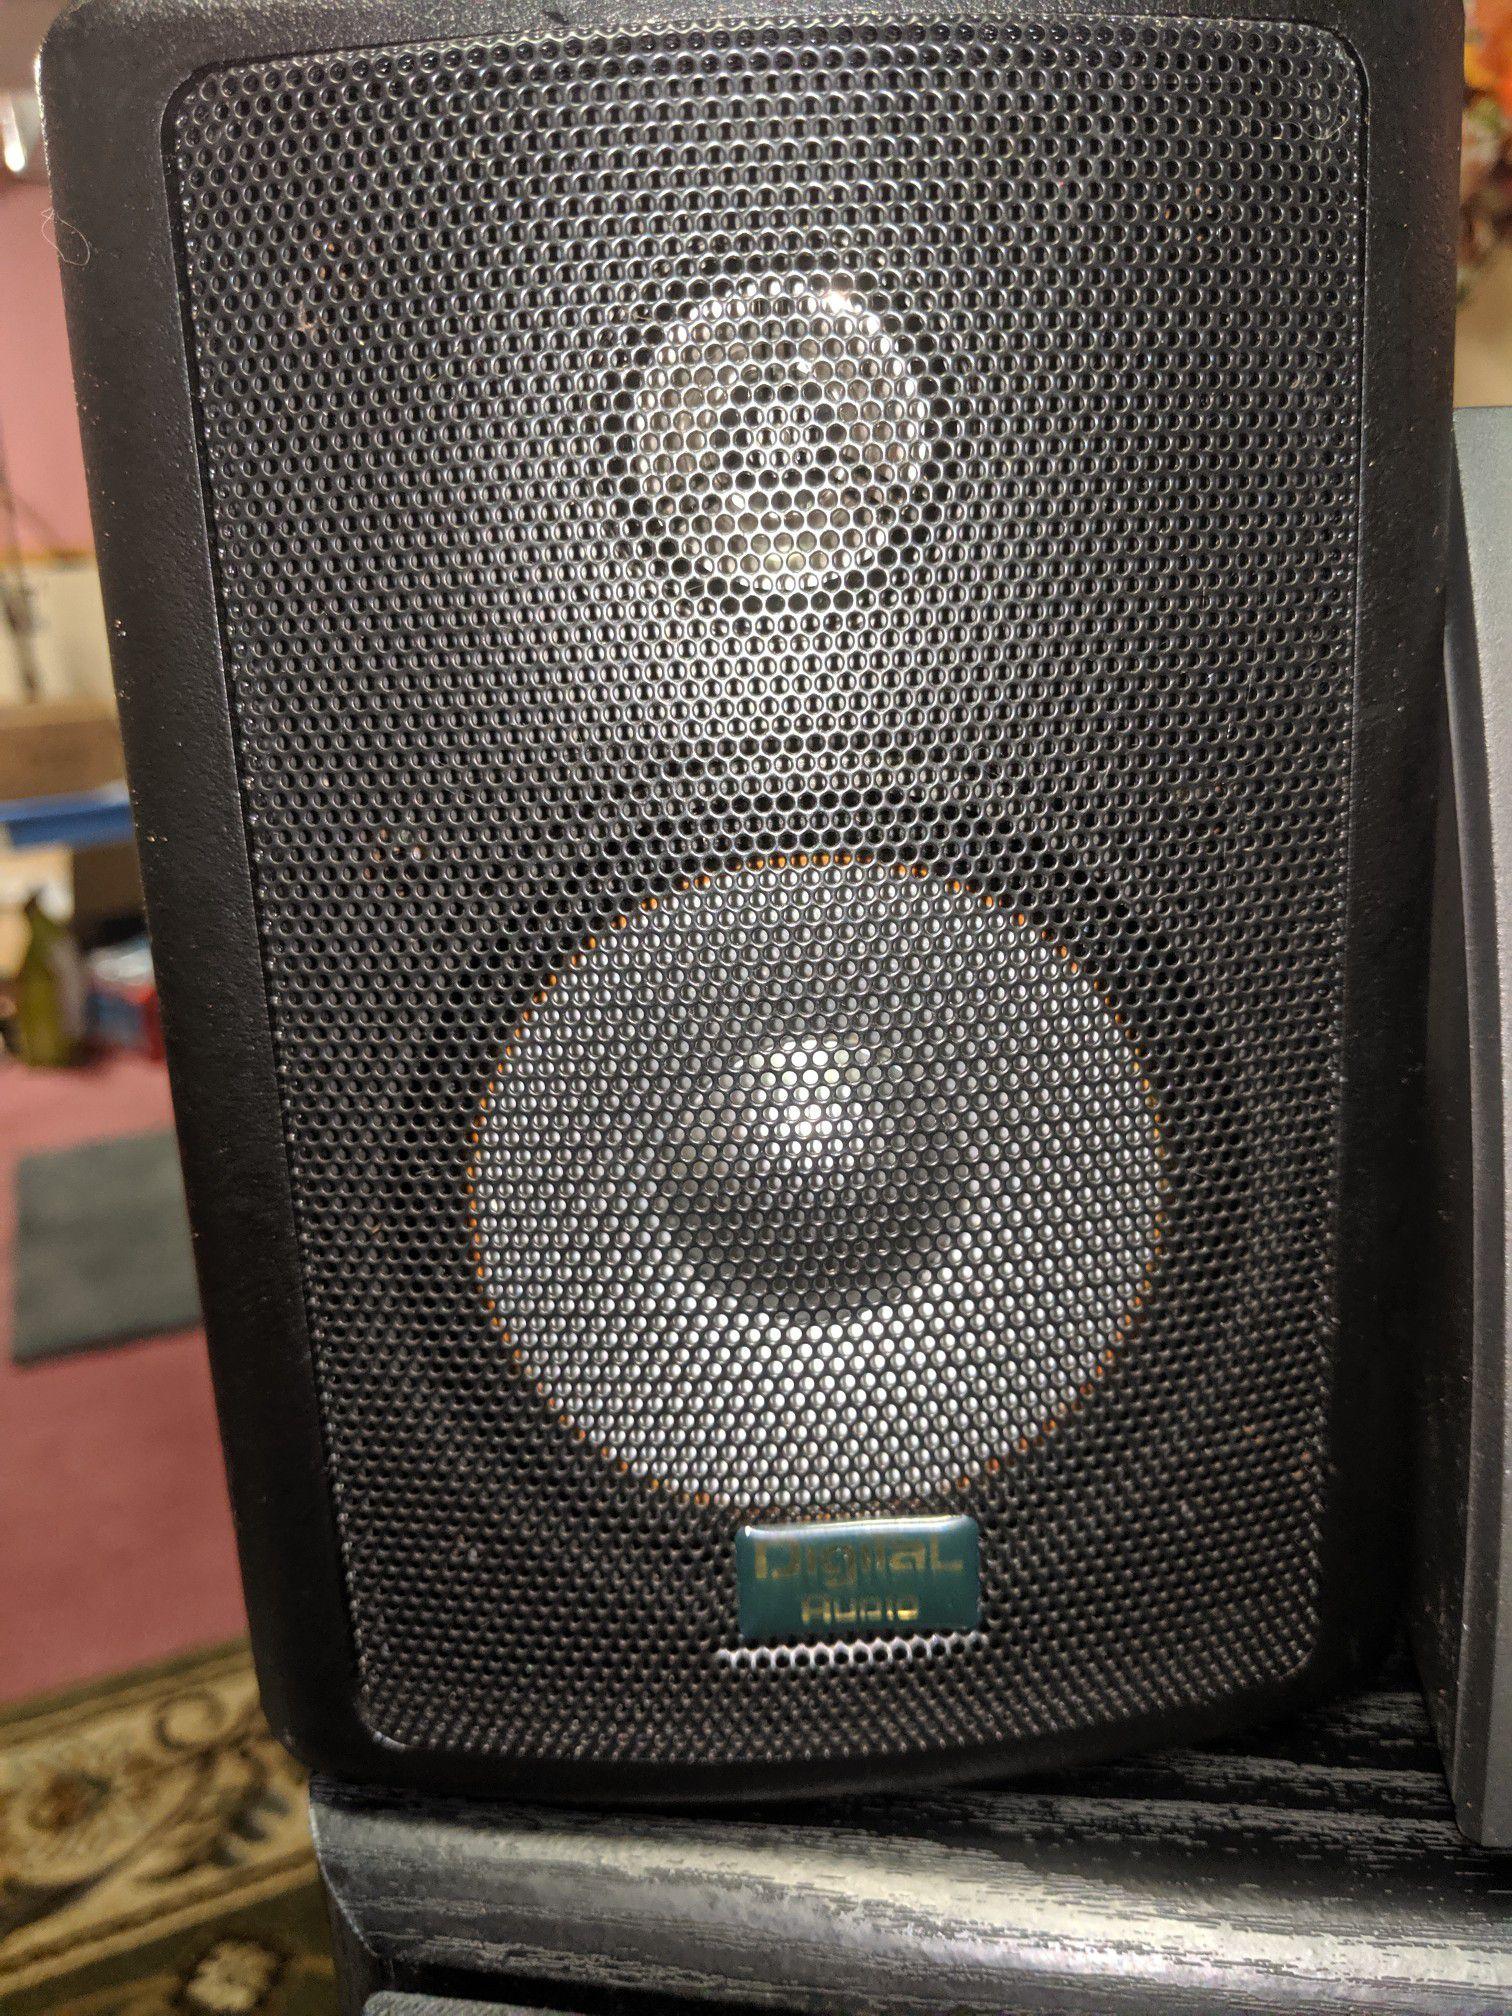 Speaker souround sound Digital pro audio Bose home theater